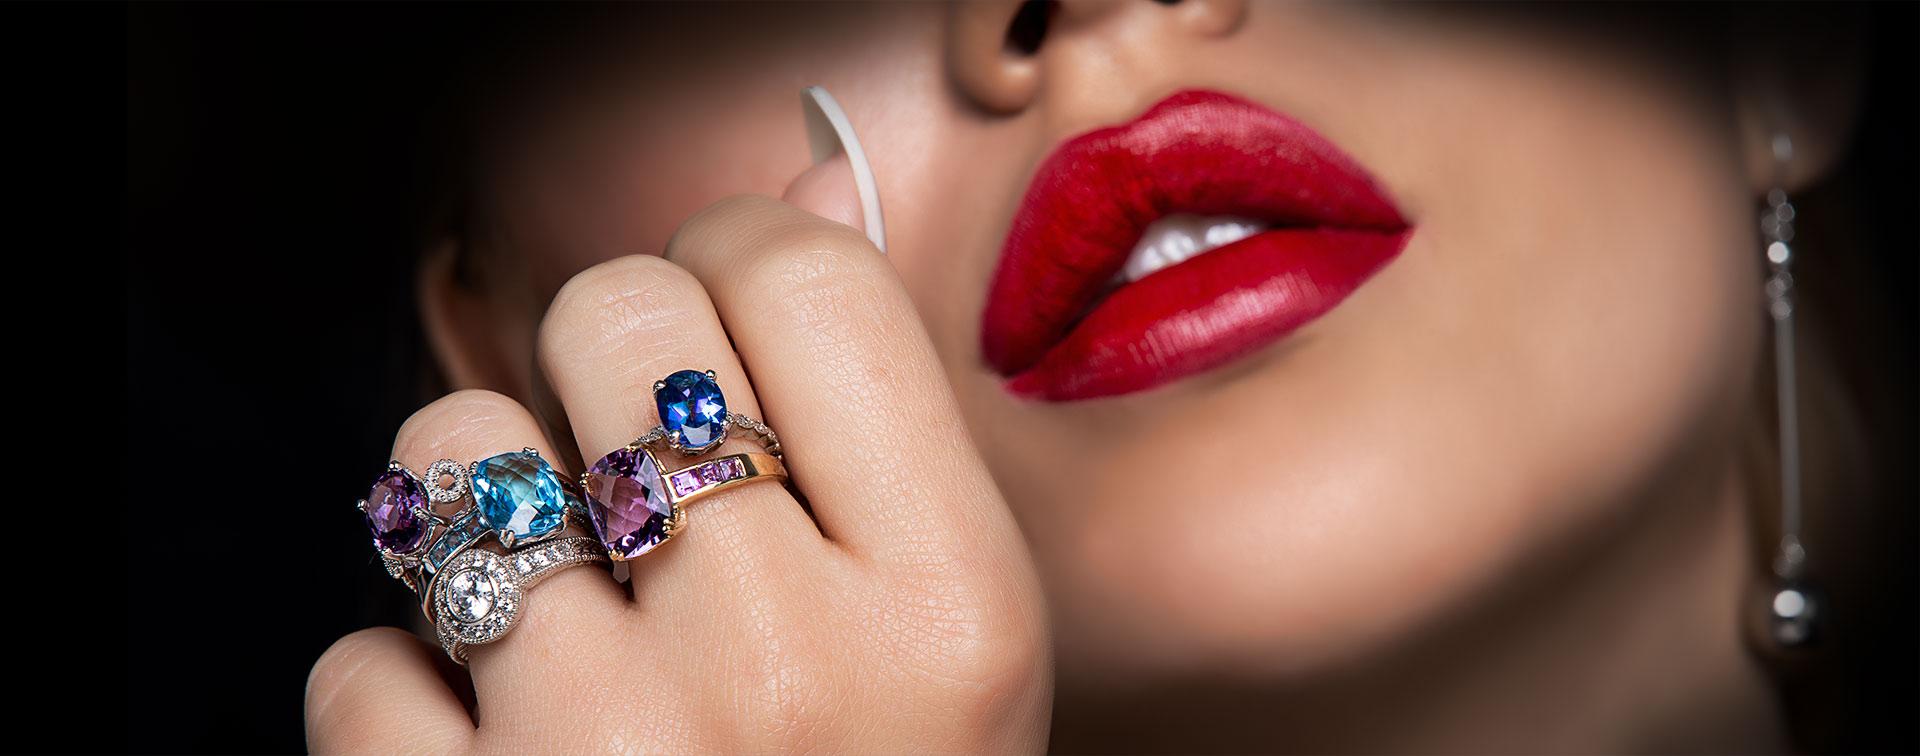 Montreal jewelry photographer, Commercial photographer, jewelry photo, claude belanger photographer, studio photographer